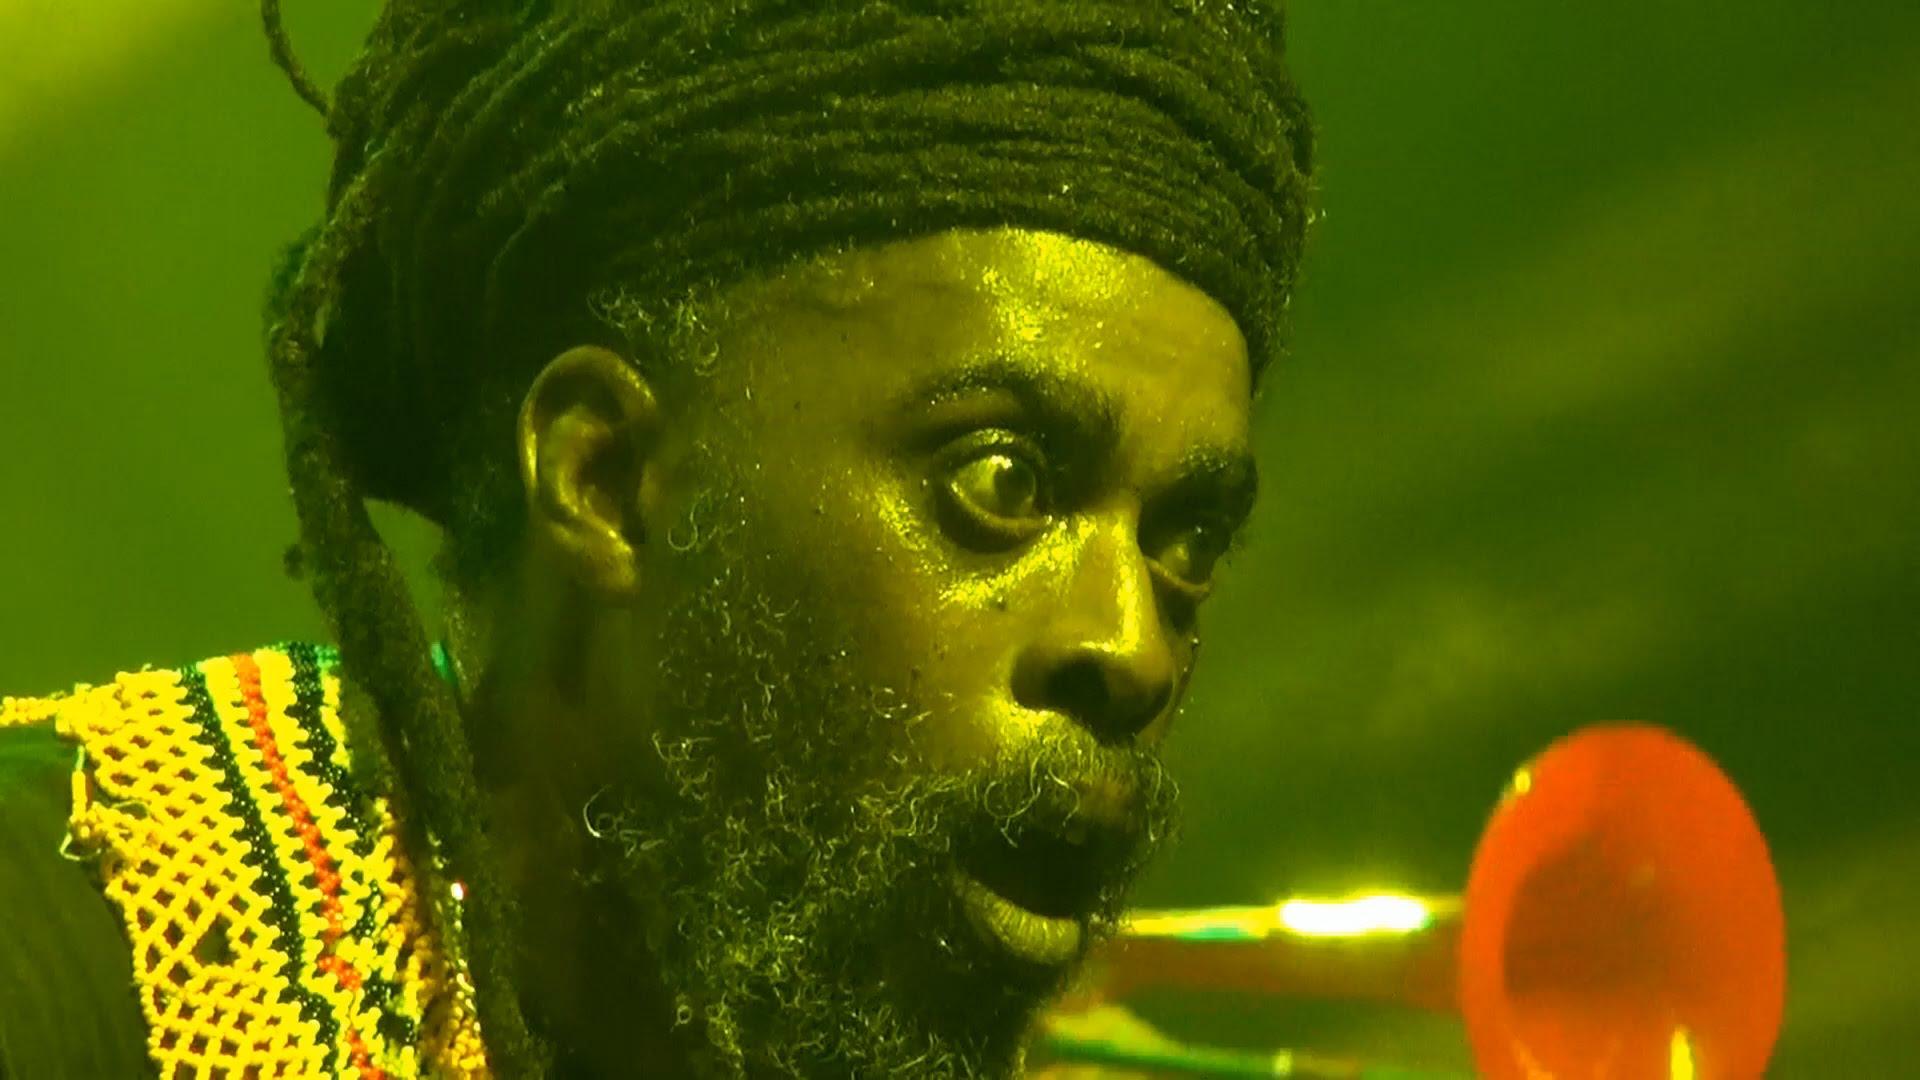 Ghetto Priest & Positive Thursdays In Dub - Jungle @ Reggae Nad Wartą 2014 [7/29/2014]